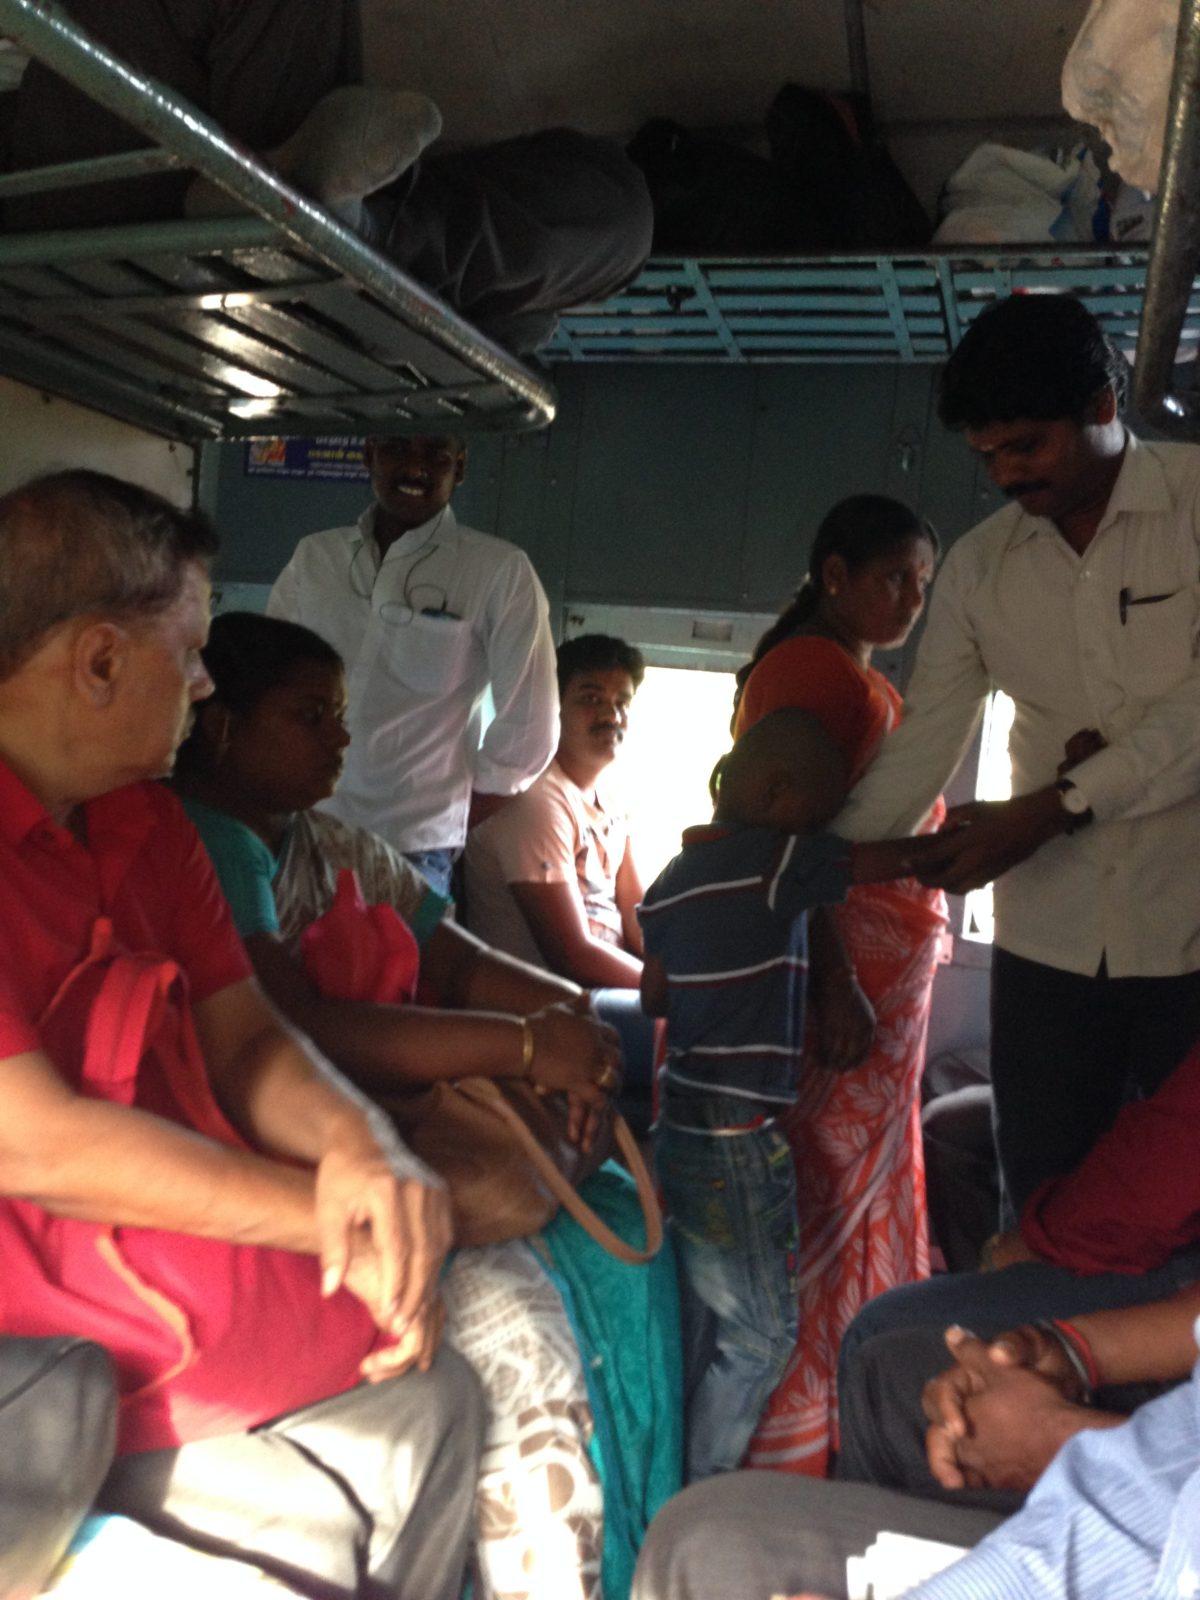 Pondicherry India Tourism: Jennifer on Clothes and Not Sad Kid